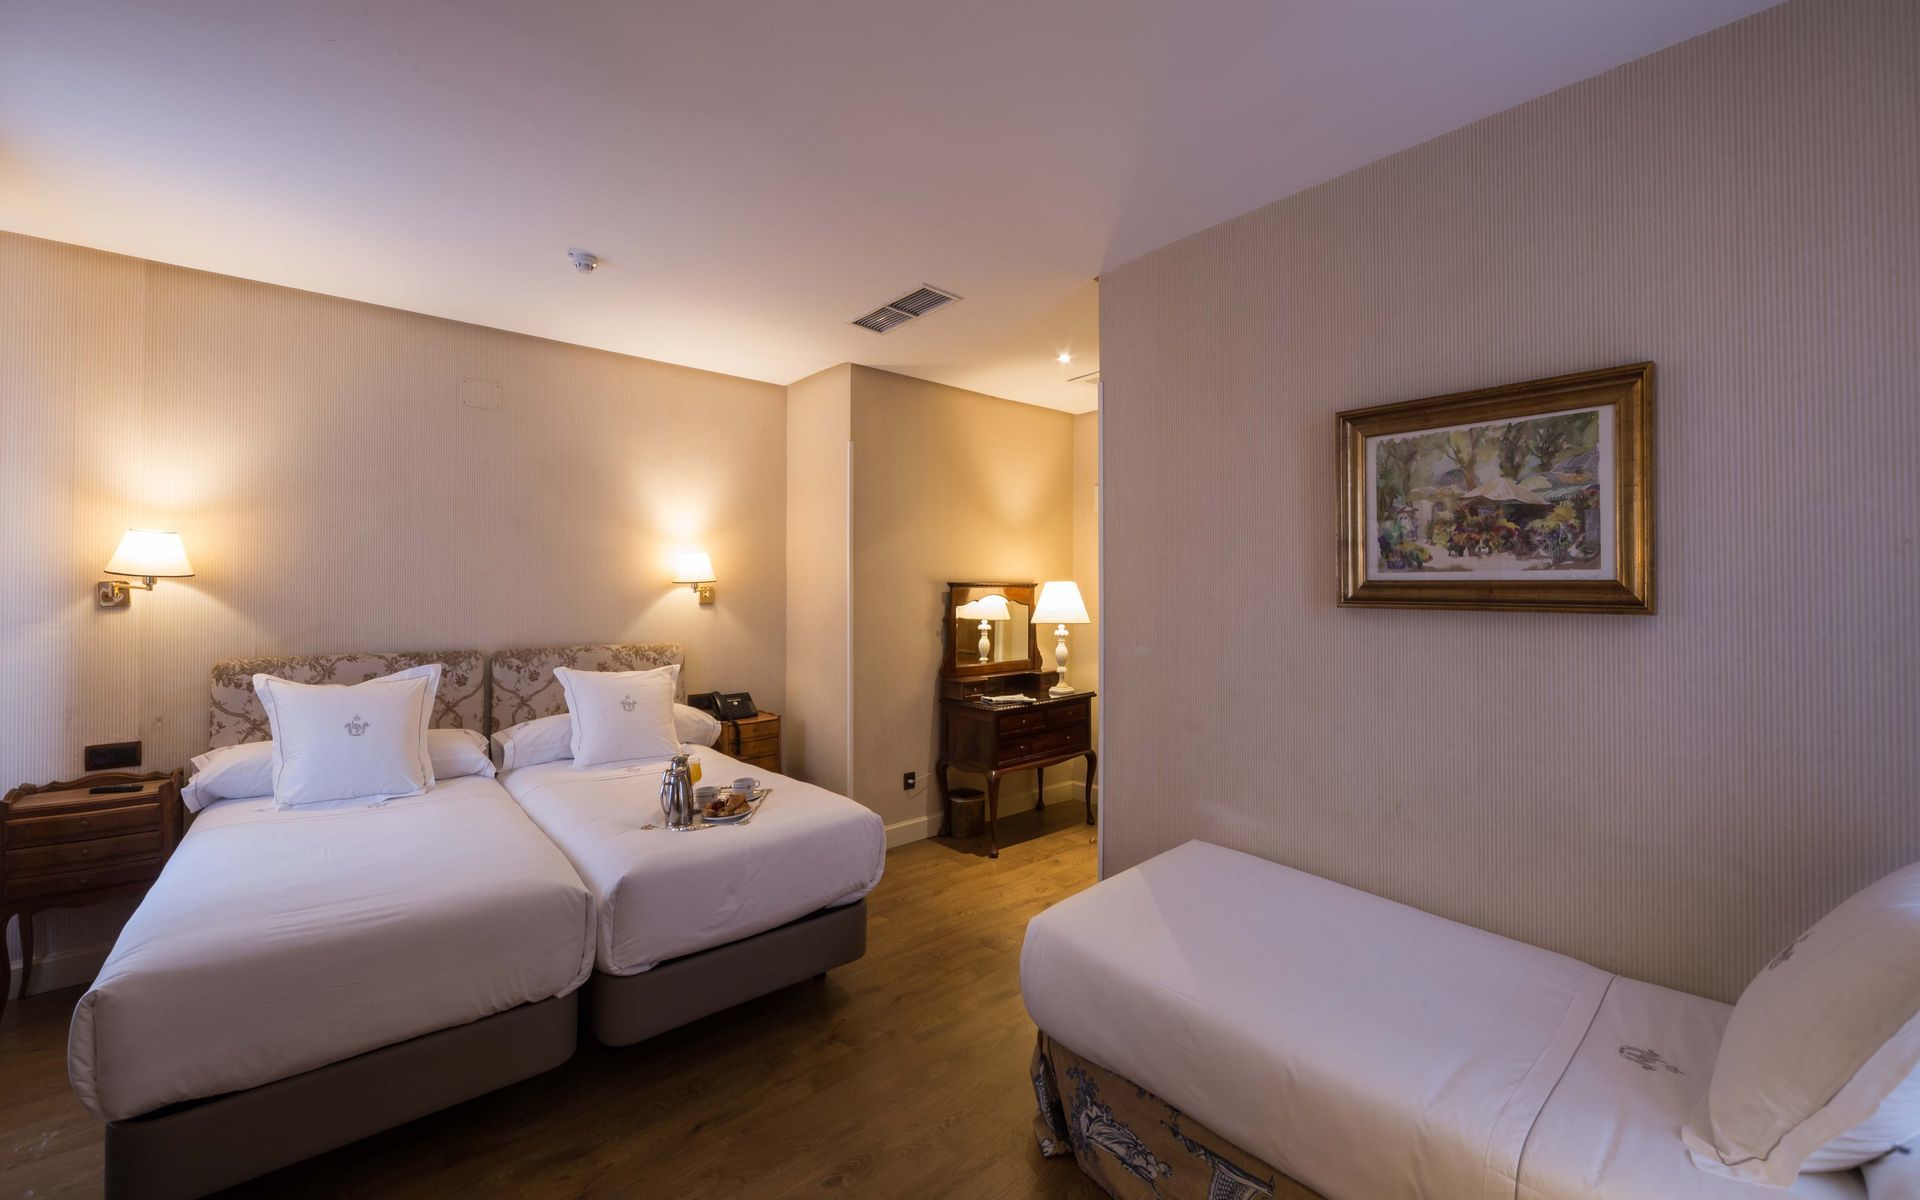 Hotel principe pio madrid for Habitacion familiar madrid